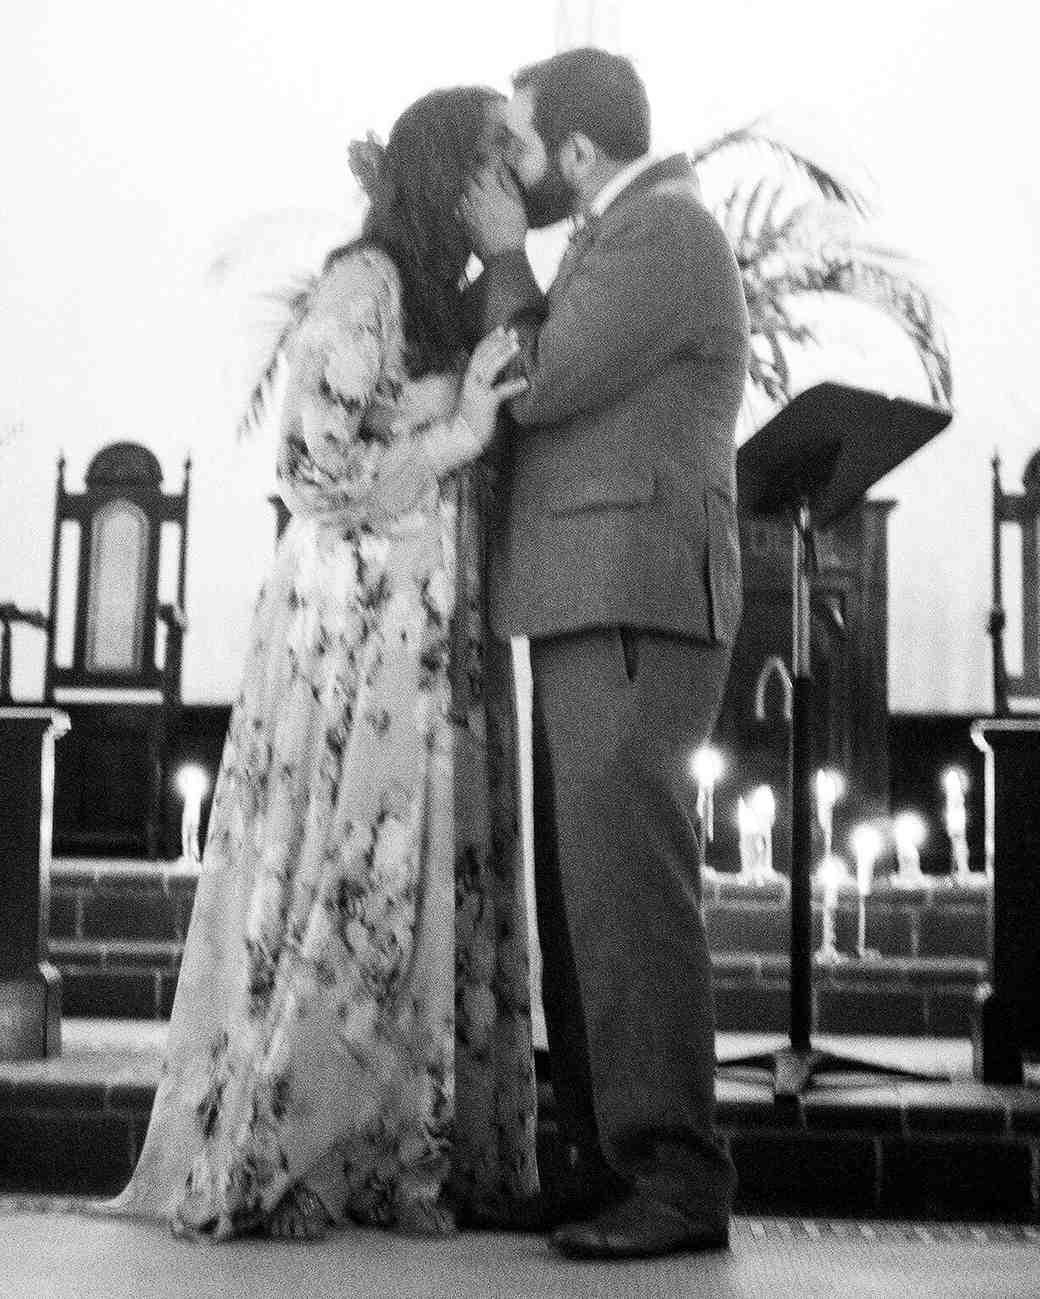 abby-jose-wedding-kiss-275-s112118-0815.jpg